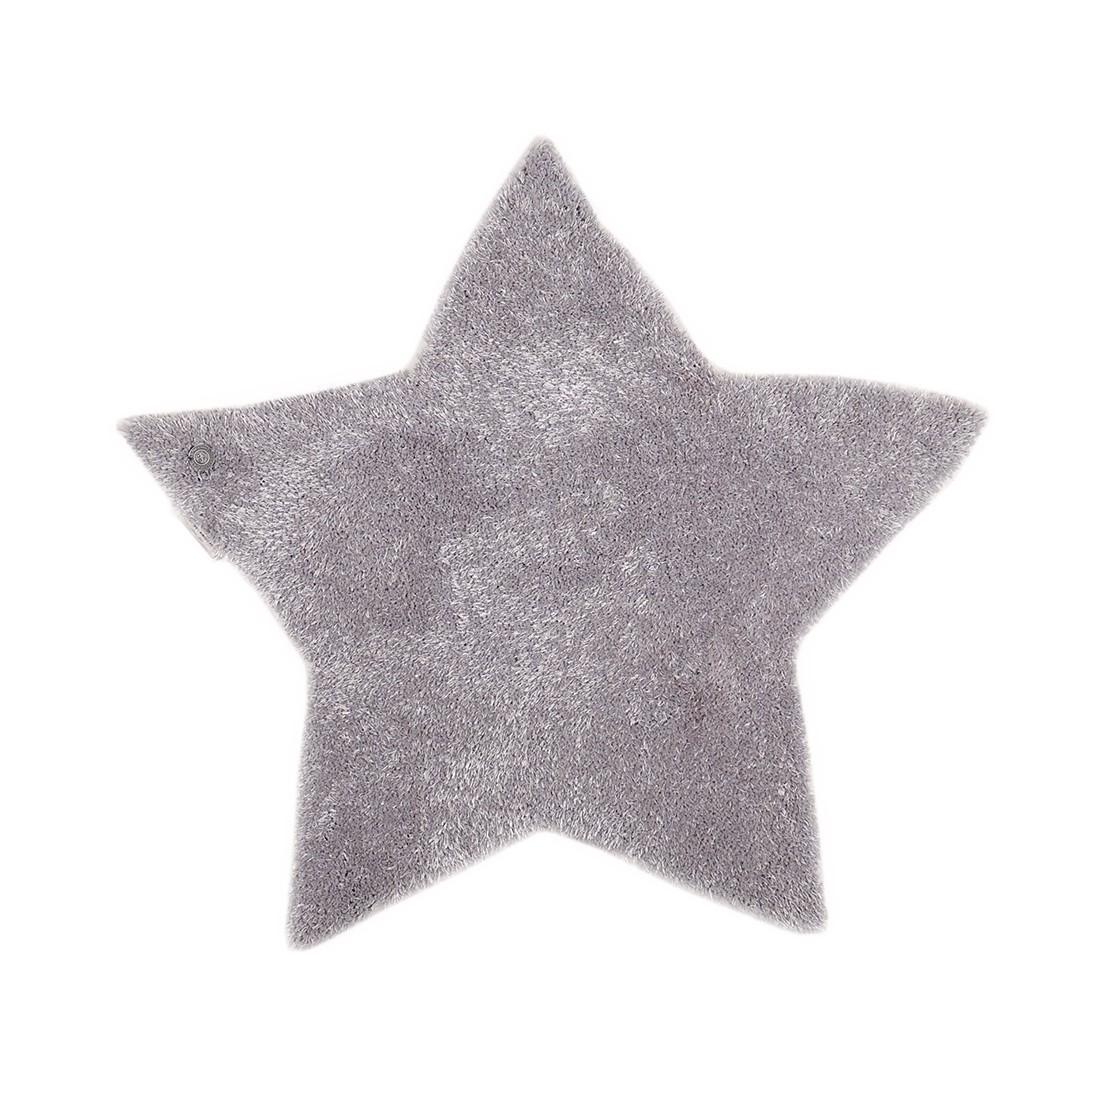 Tapijt Soft Star, Tom Tailor